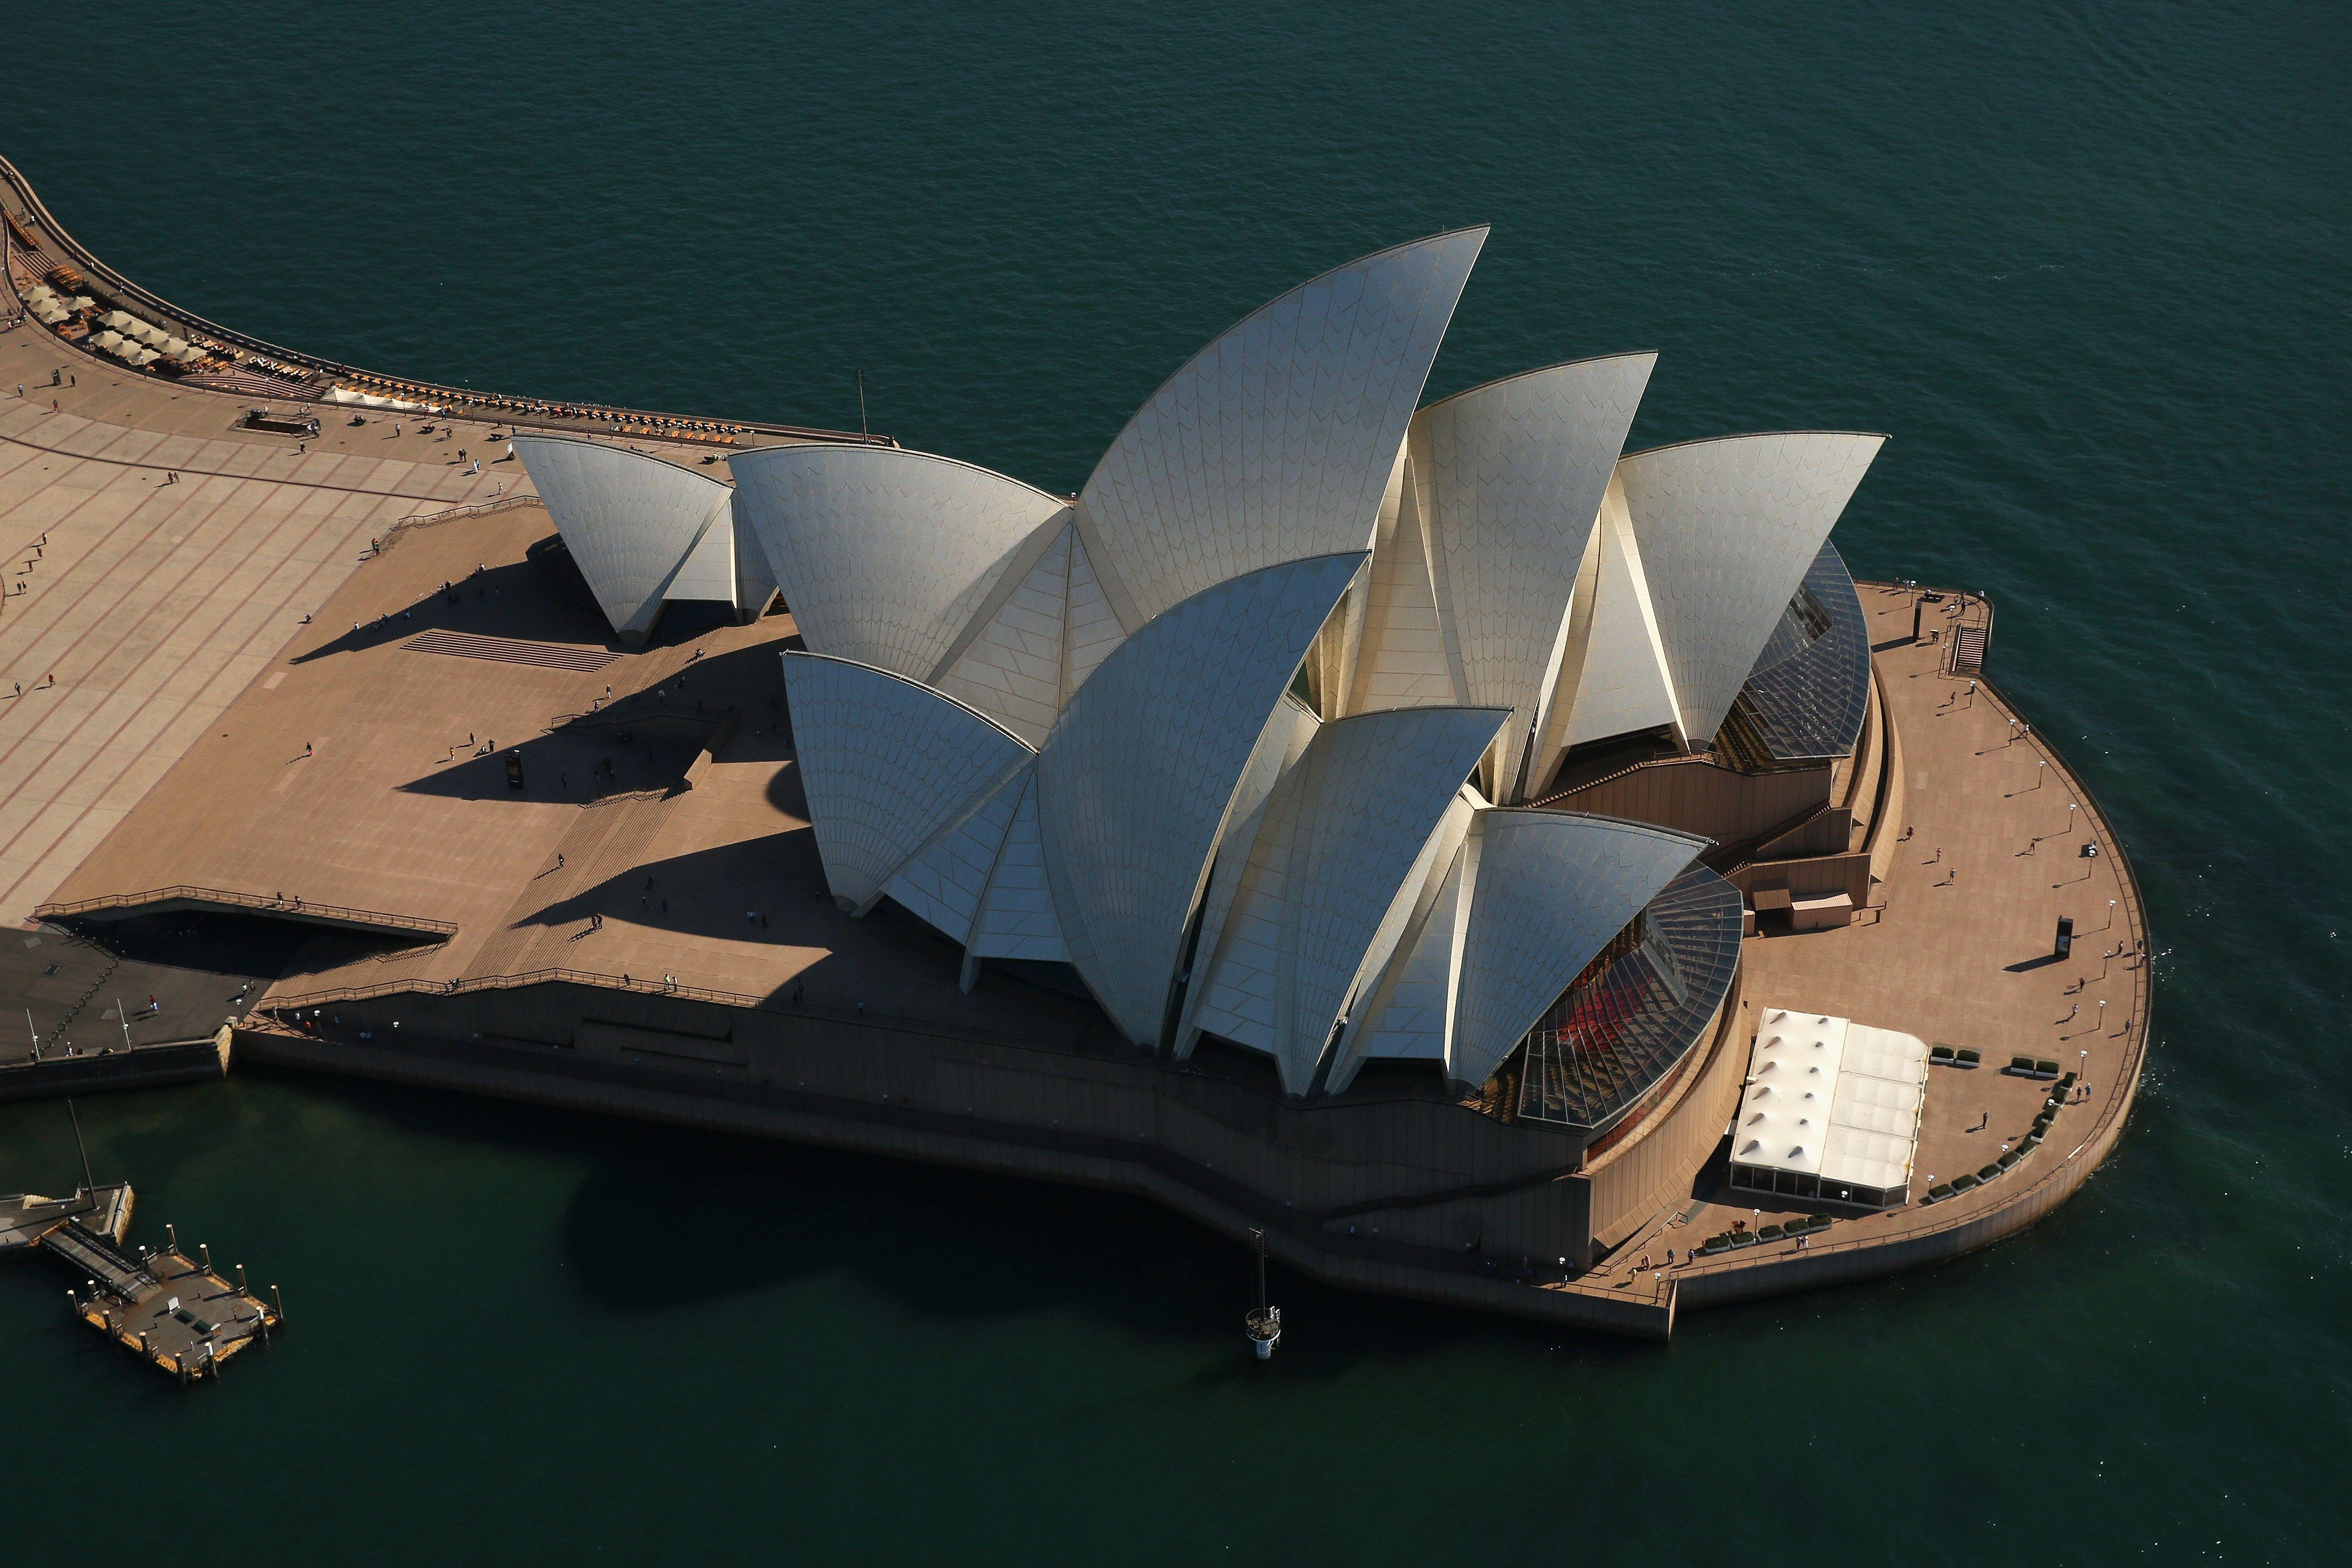 Overhead view of the Sydney Opera House, Australia